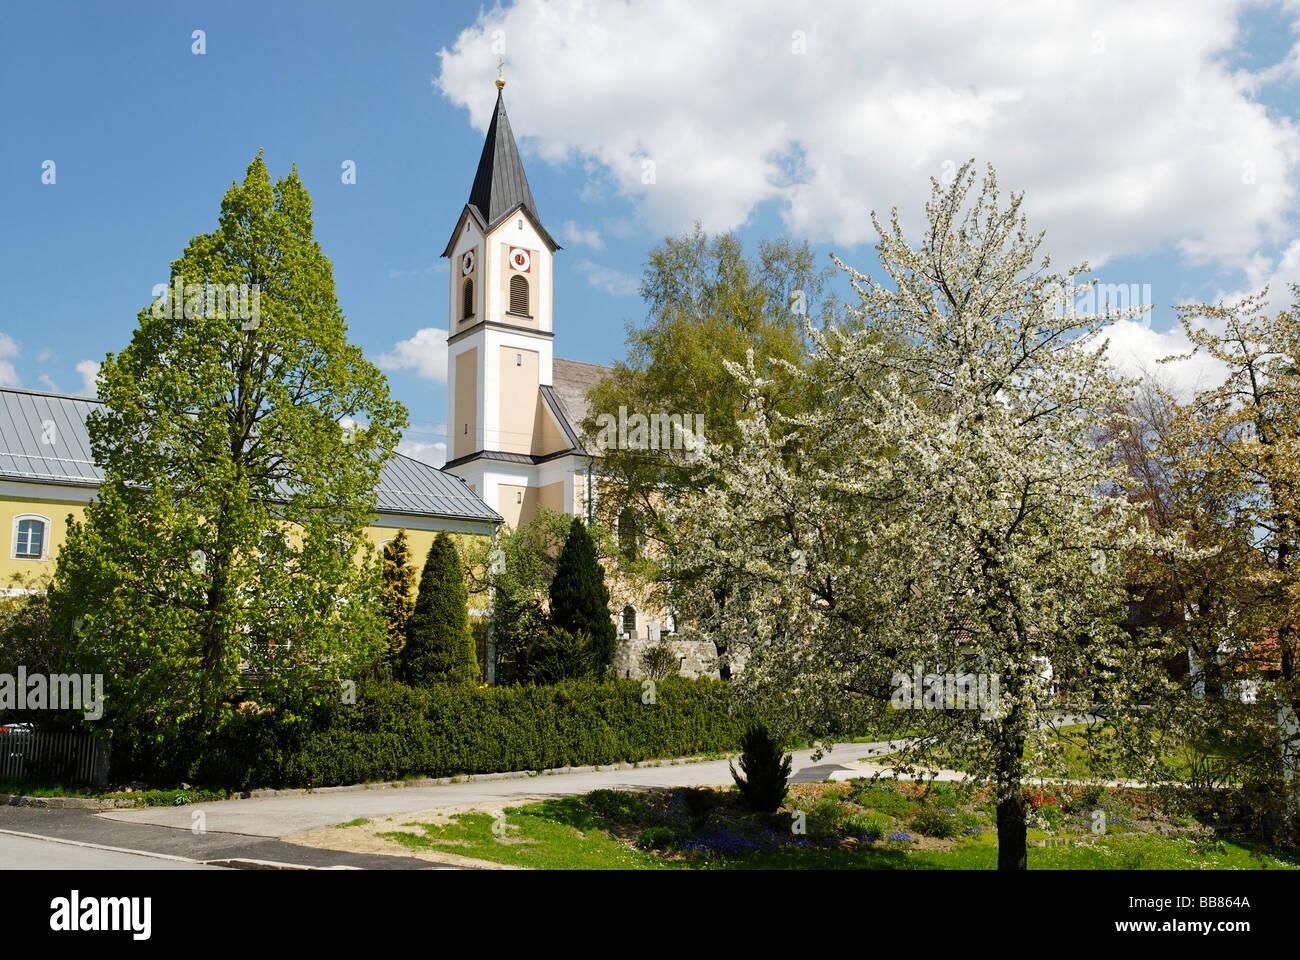 Parish church St Raymund, Breitenberg, Bavarian Forest, Lower Bavaria, Germany, Europe Stock Photo